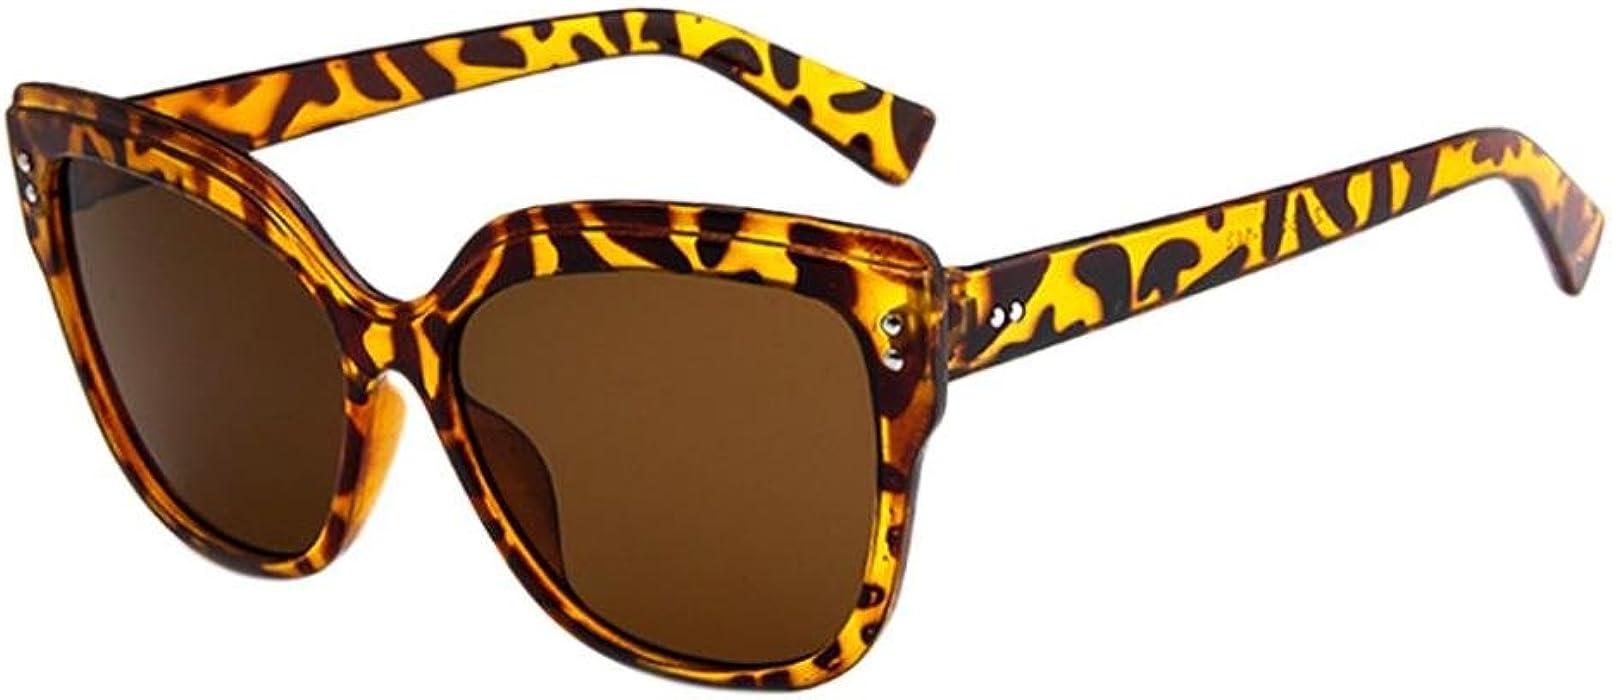 21e35d7364dc92 Sonnenbrille Damen Herren Retro Vintage Rapper Sonnenbrillen Brillen